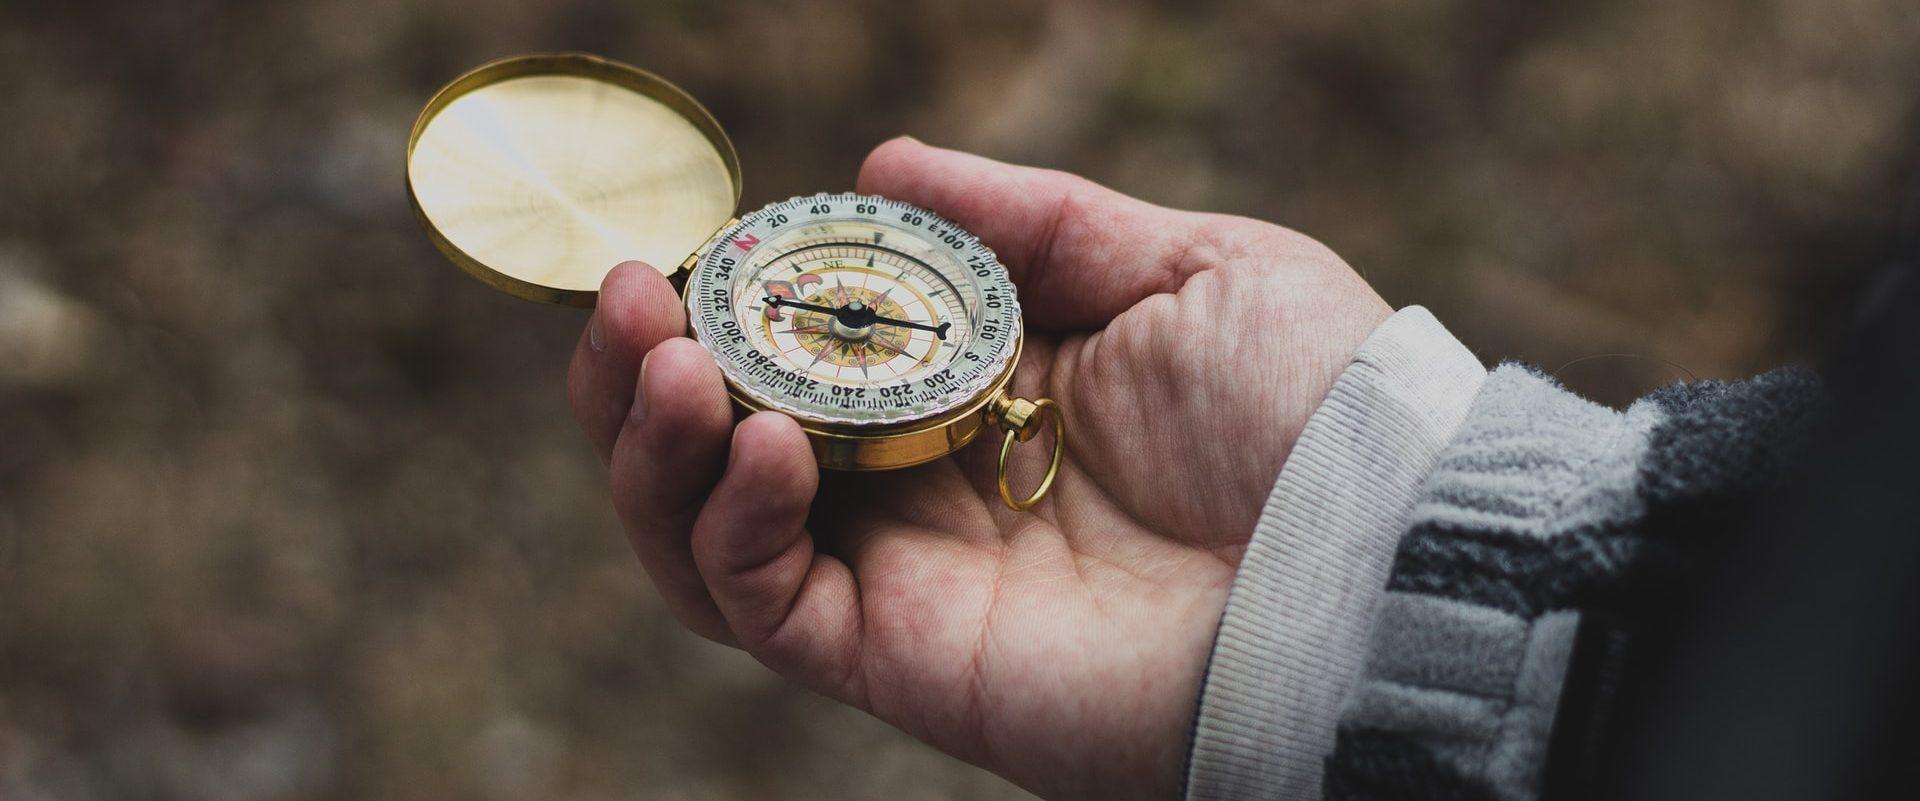 Discipleship – Find